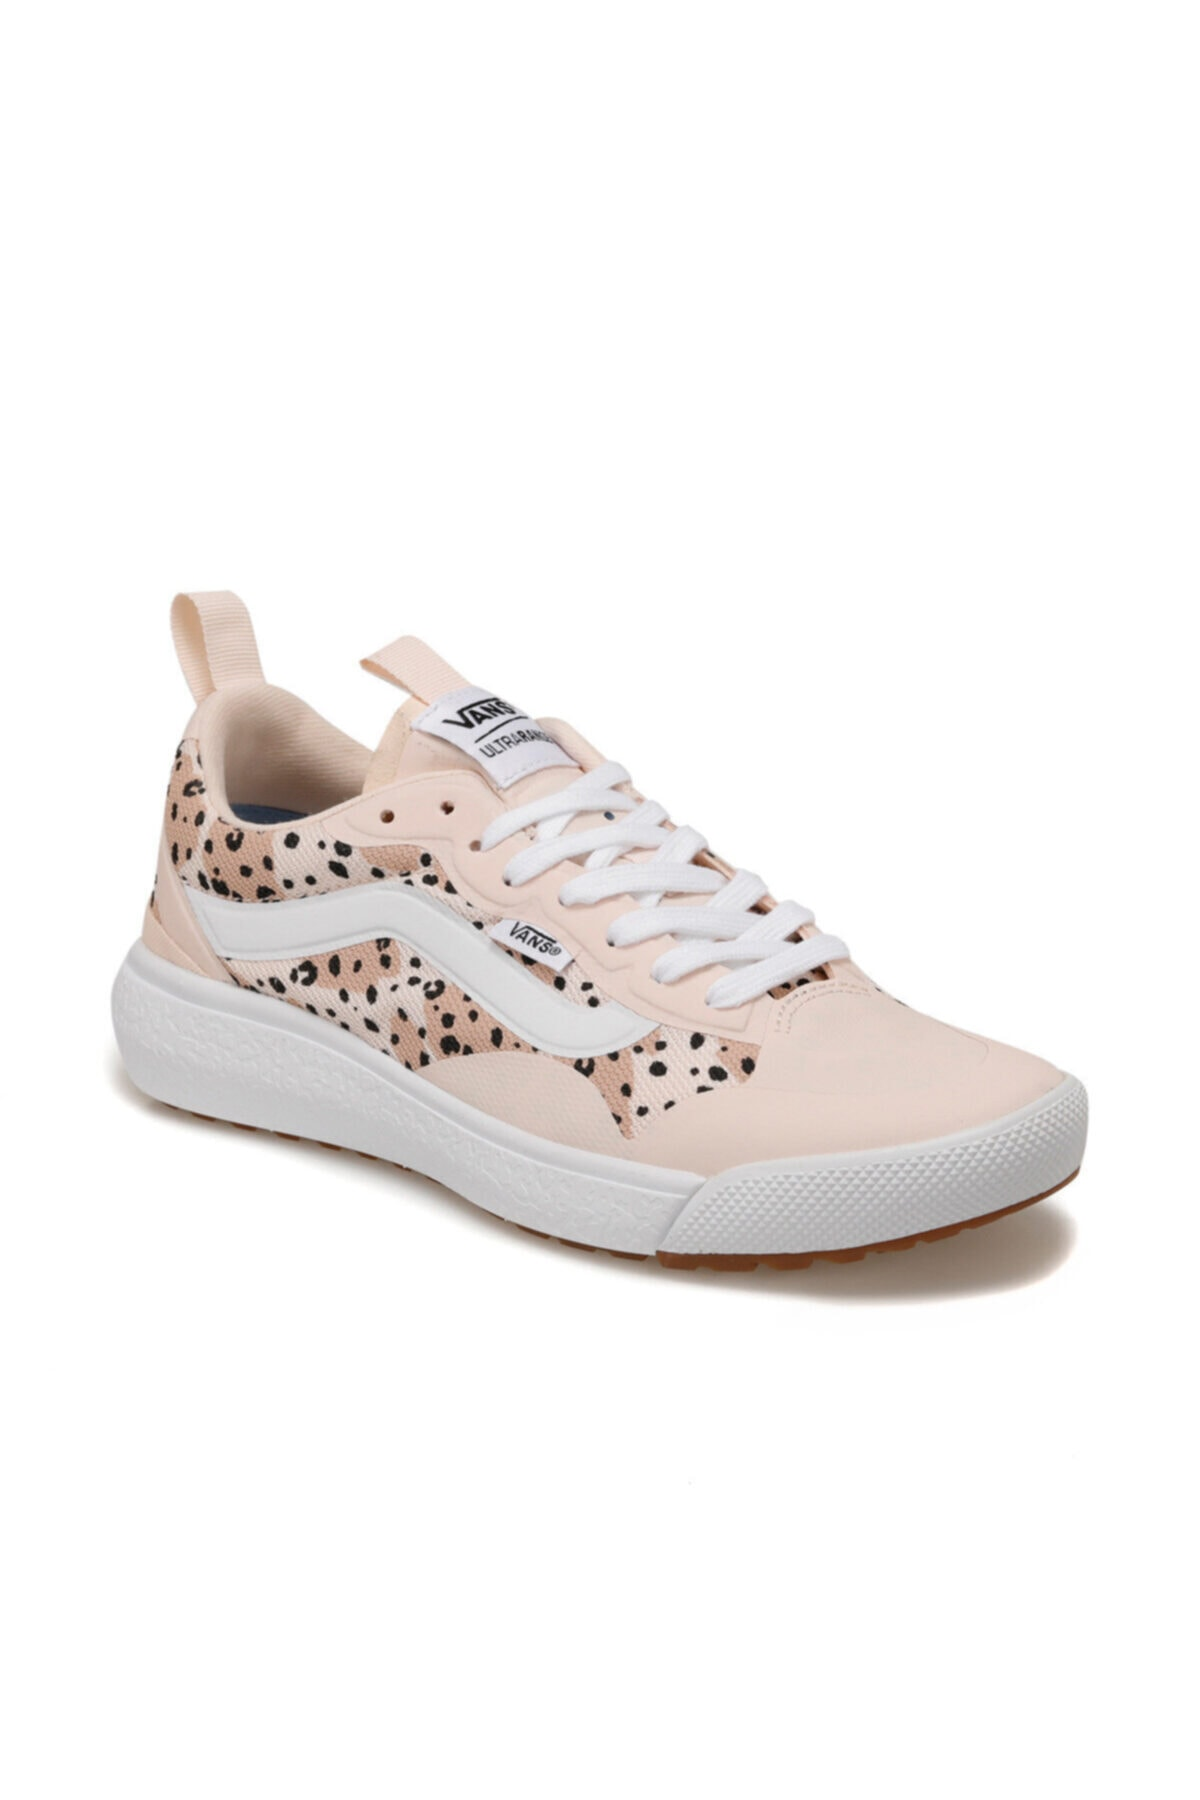 Vans UA ULTRARANGE EXO Pembe Erkek Çocuk Sneaker Ayakkabı 100583577 1